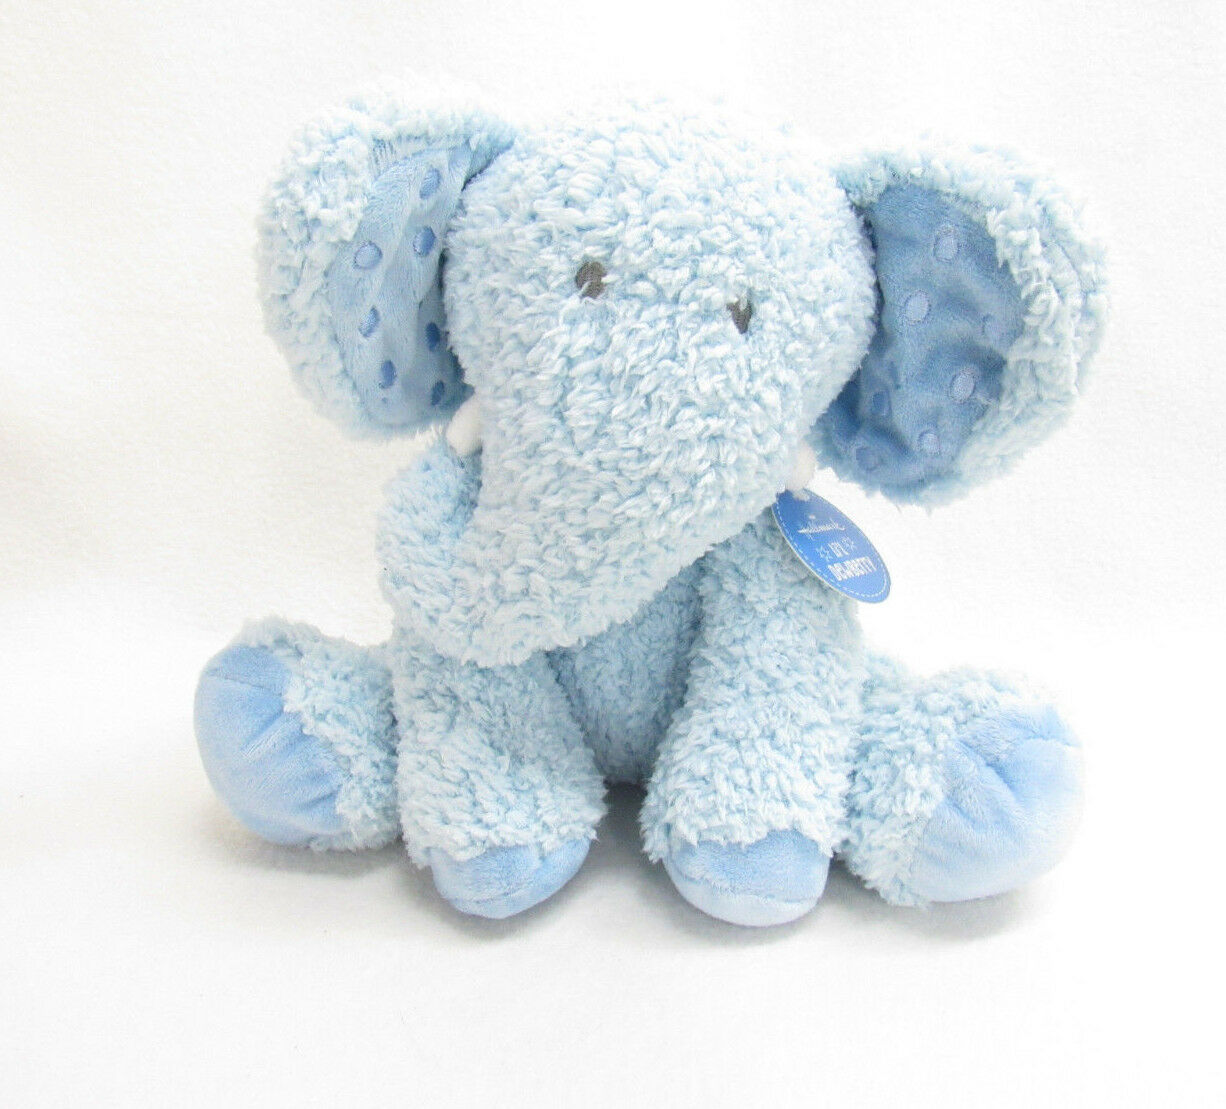 HALLMARK LI'L DEWBERRY STUFFED BABY ELEPHANT DOLL